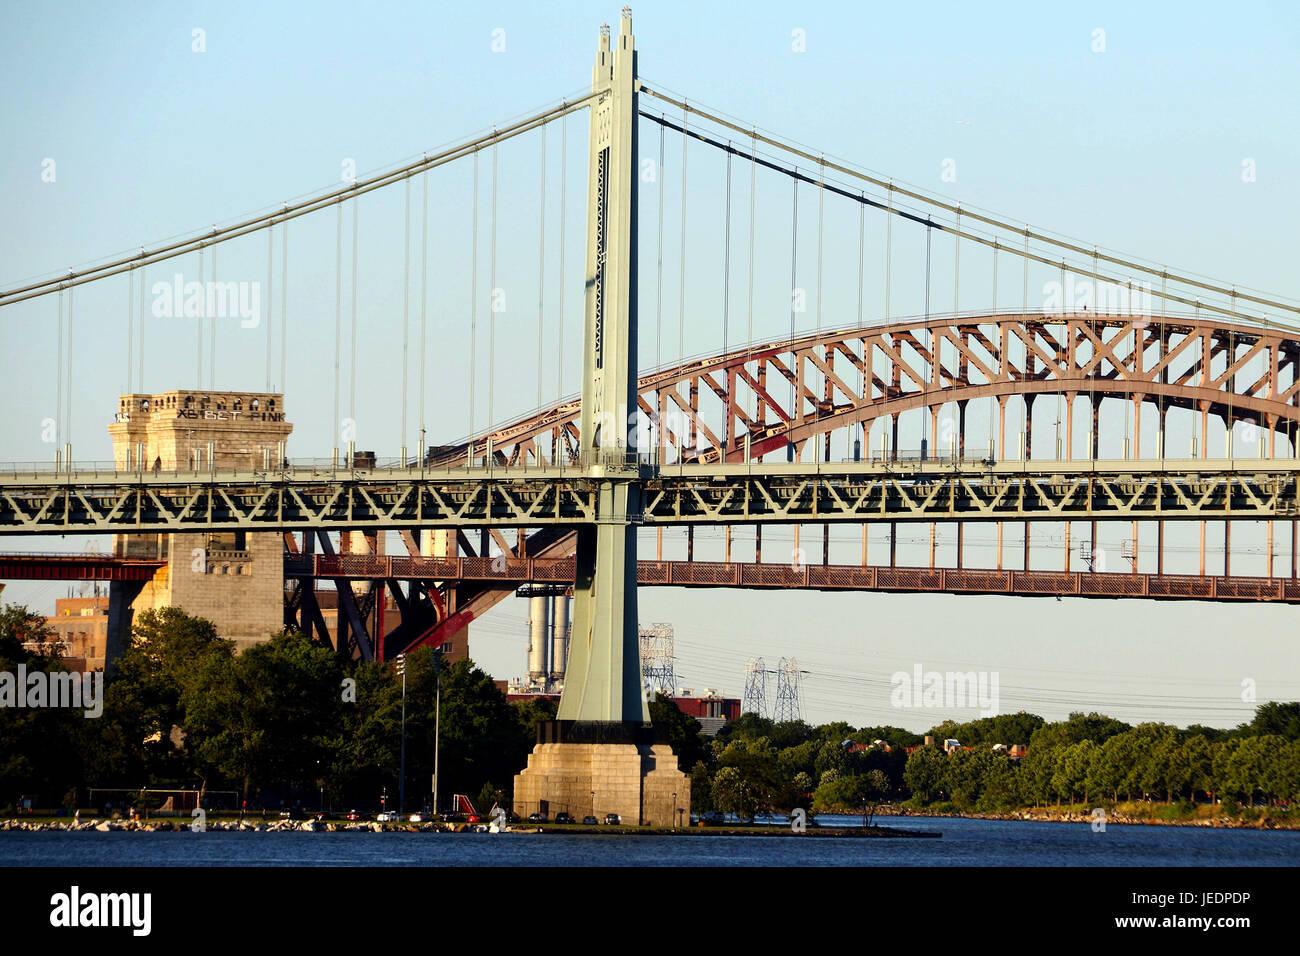 Robert F. Kennedy Bridge, also know as RFK Triborough Bridge, seen at sundown - Stock Image